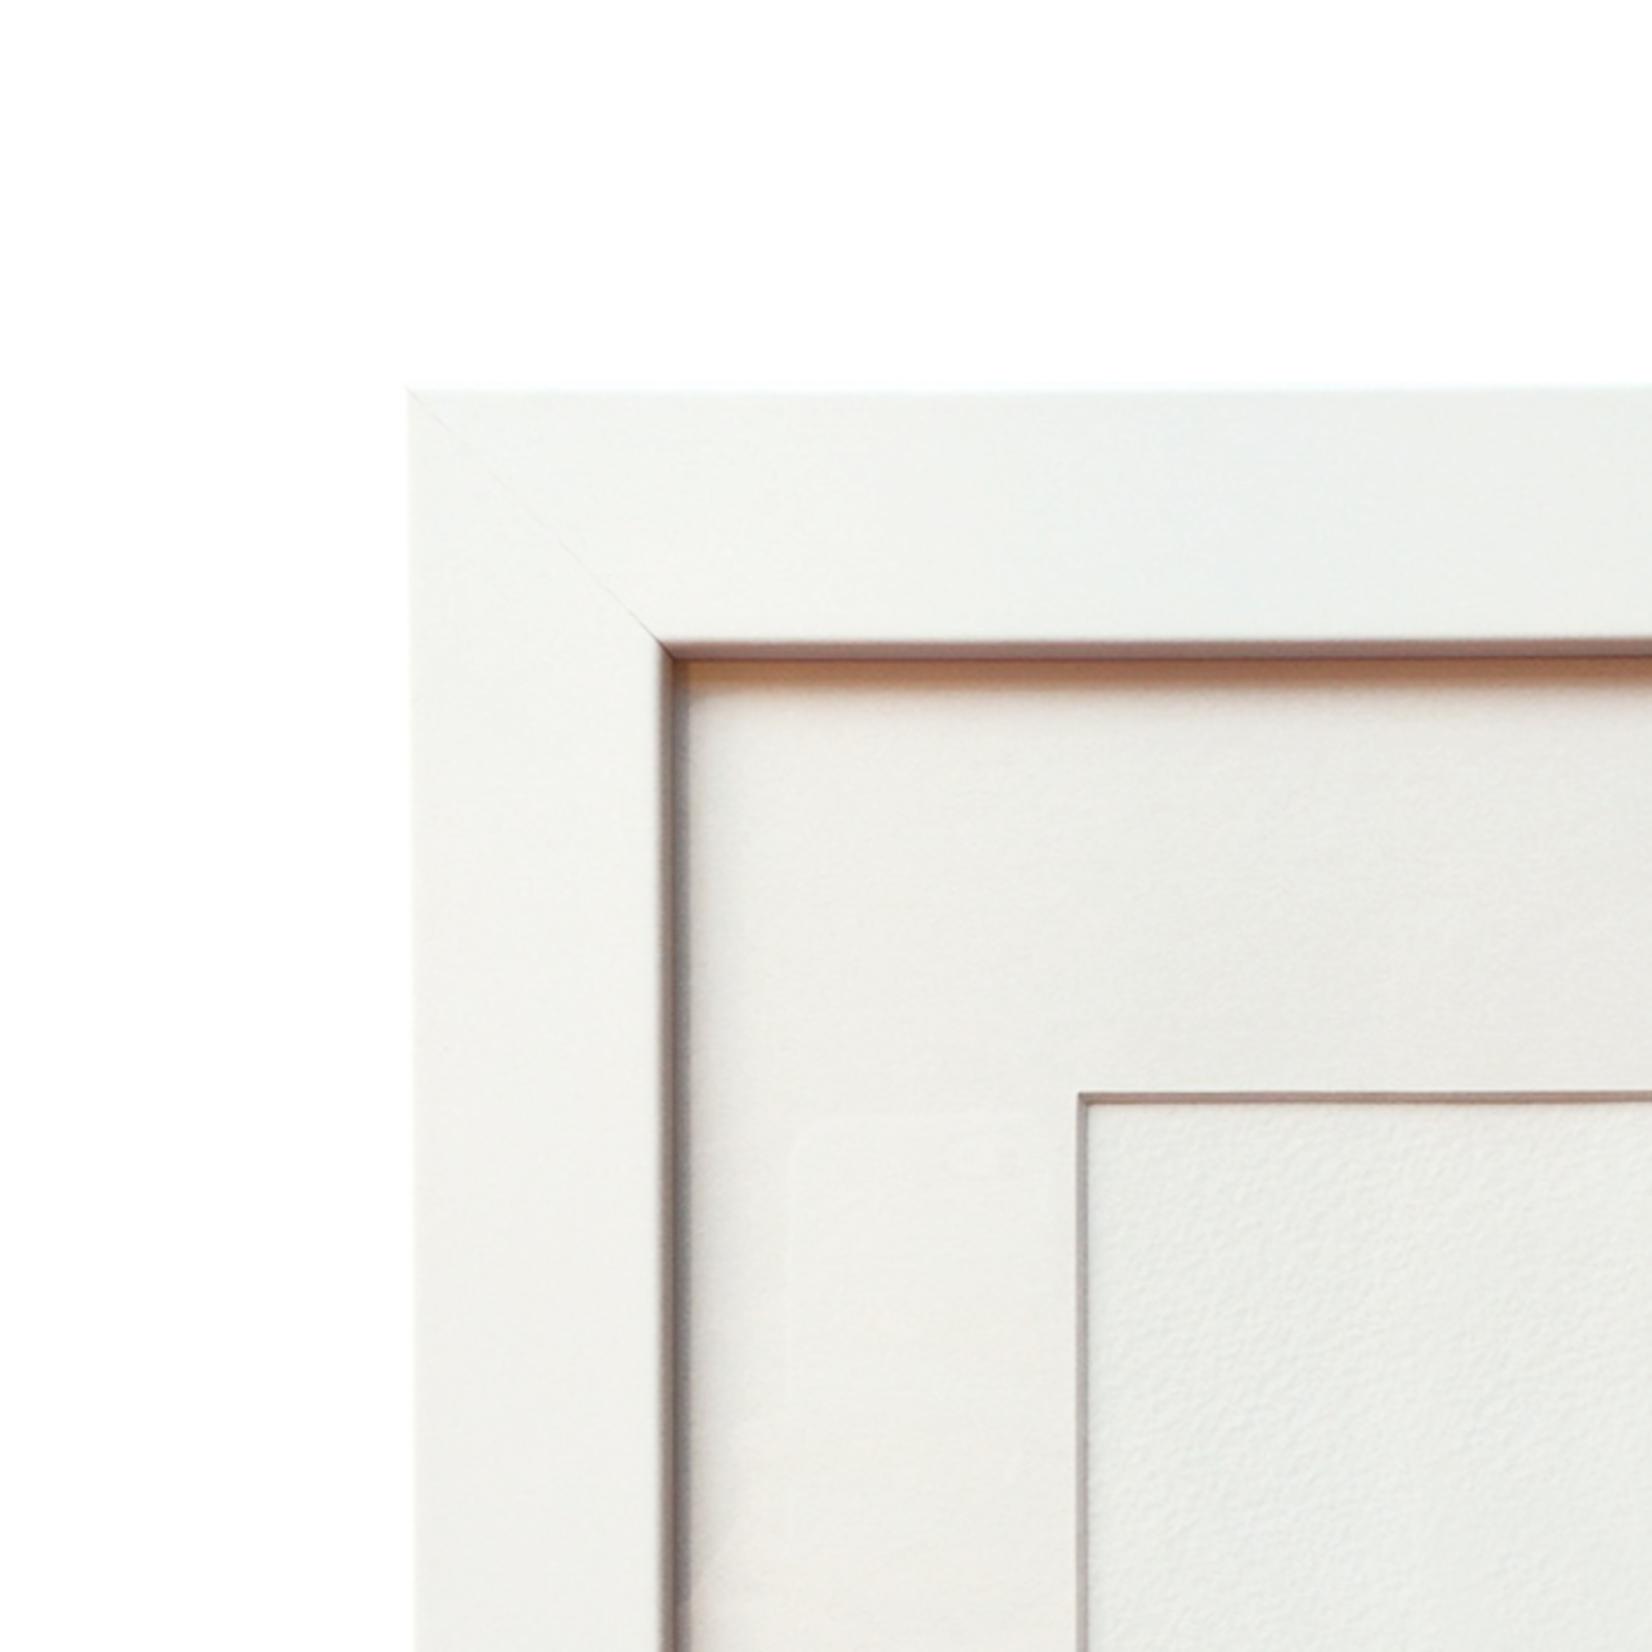 Limited Edition Prints Aquamarine nude, 2017